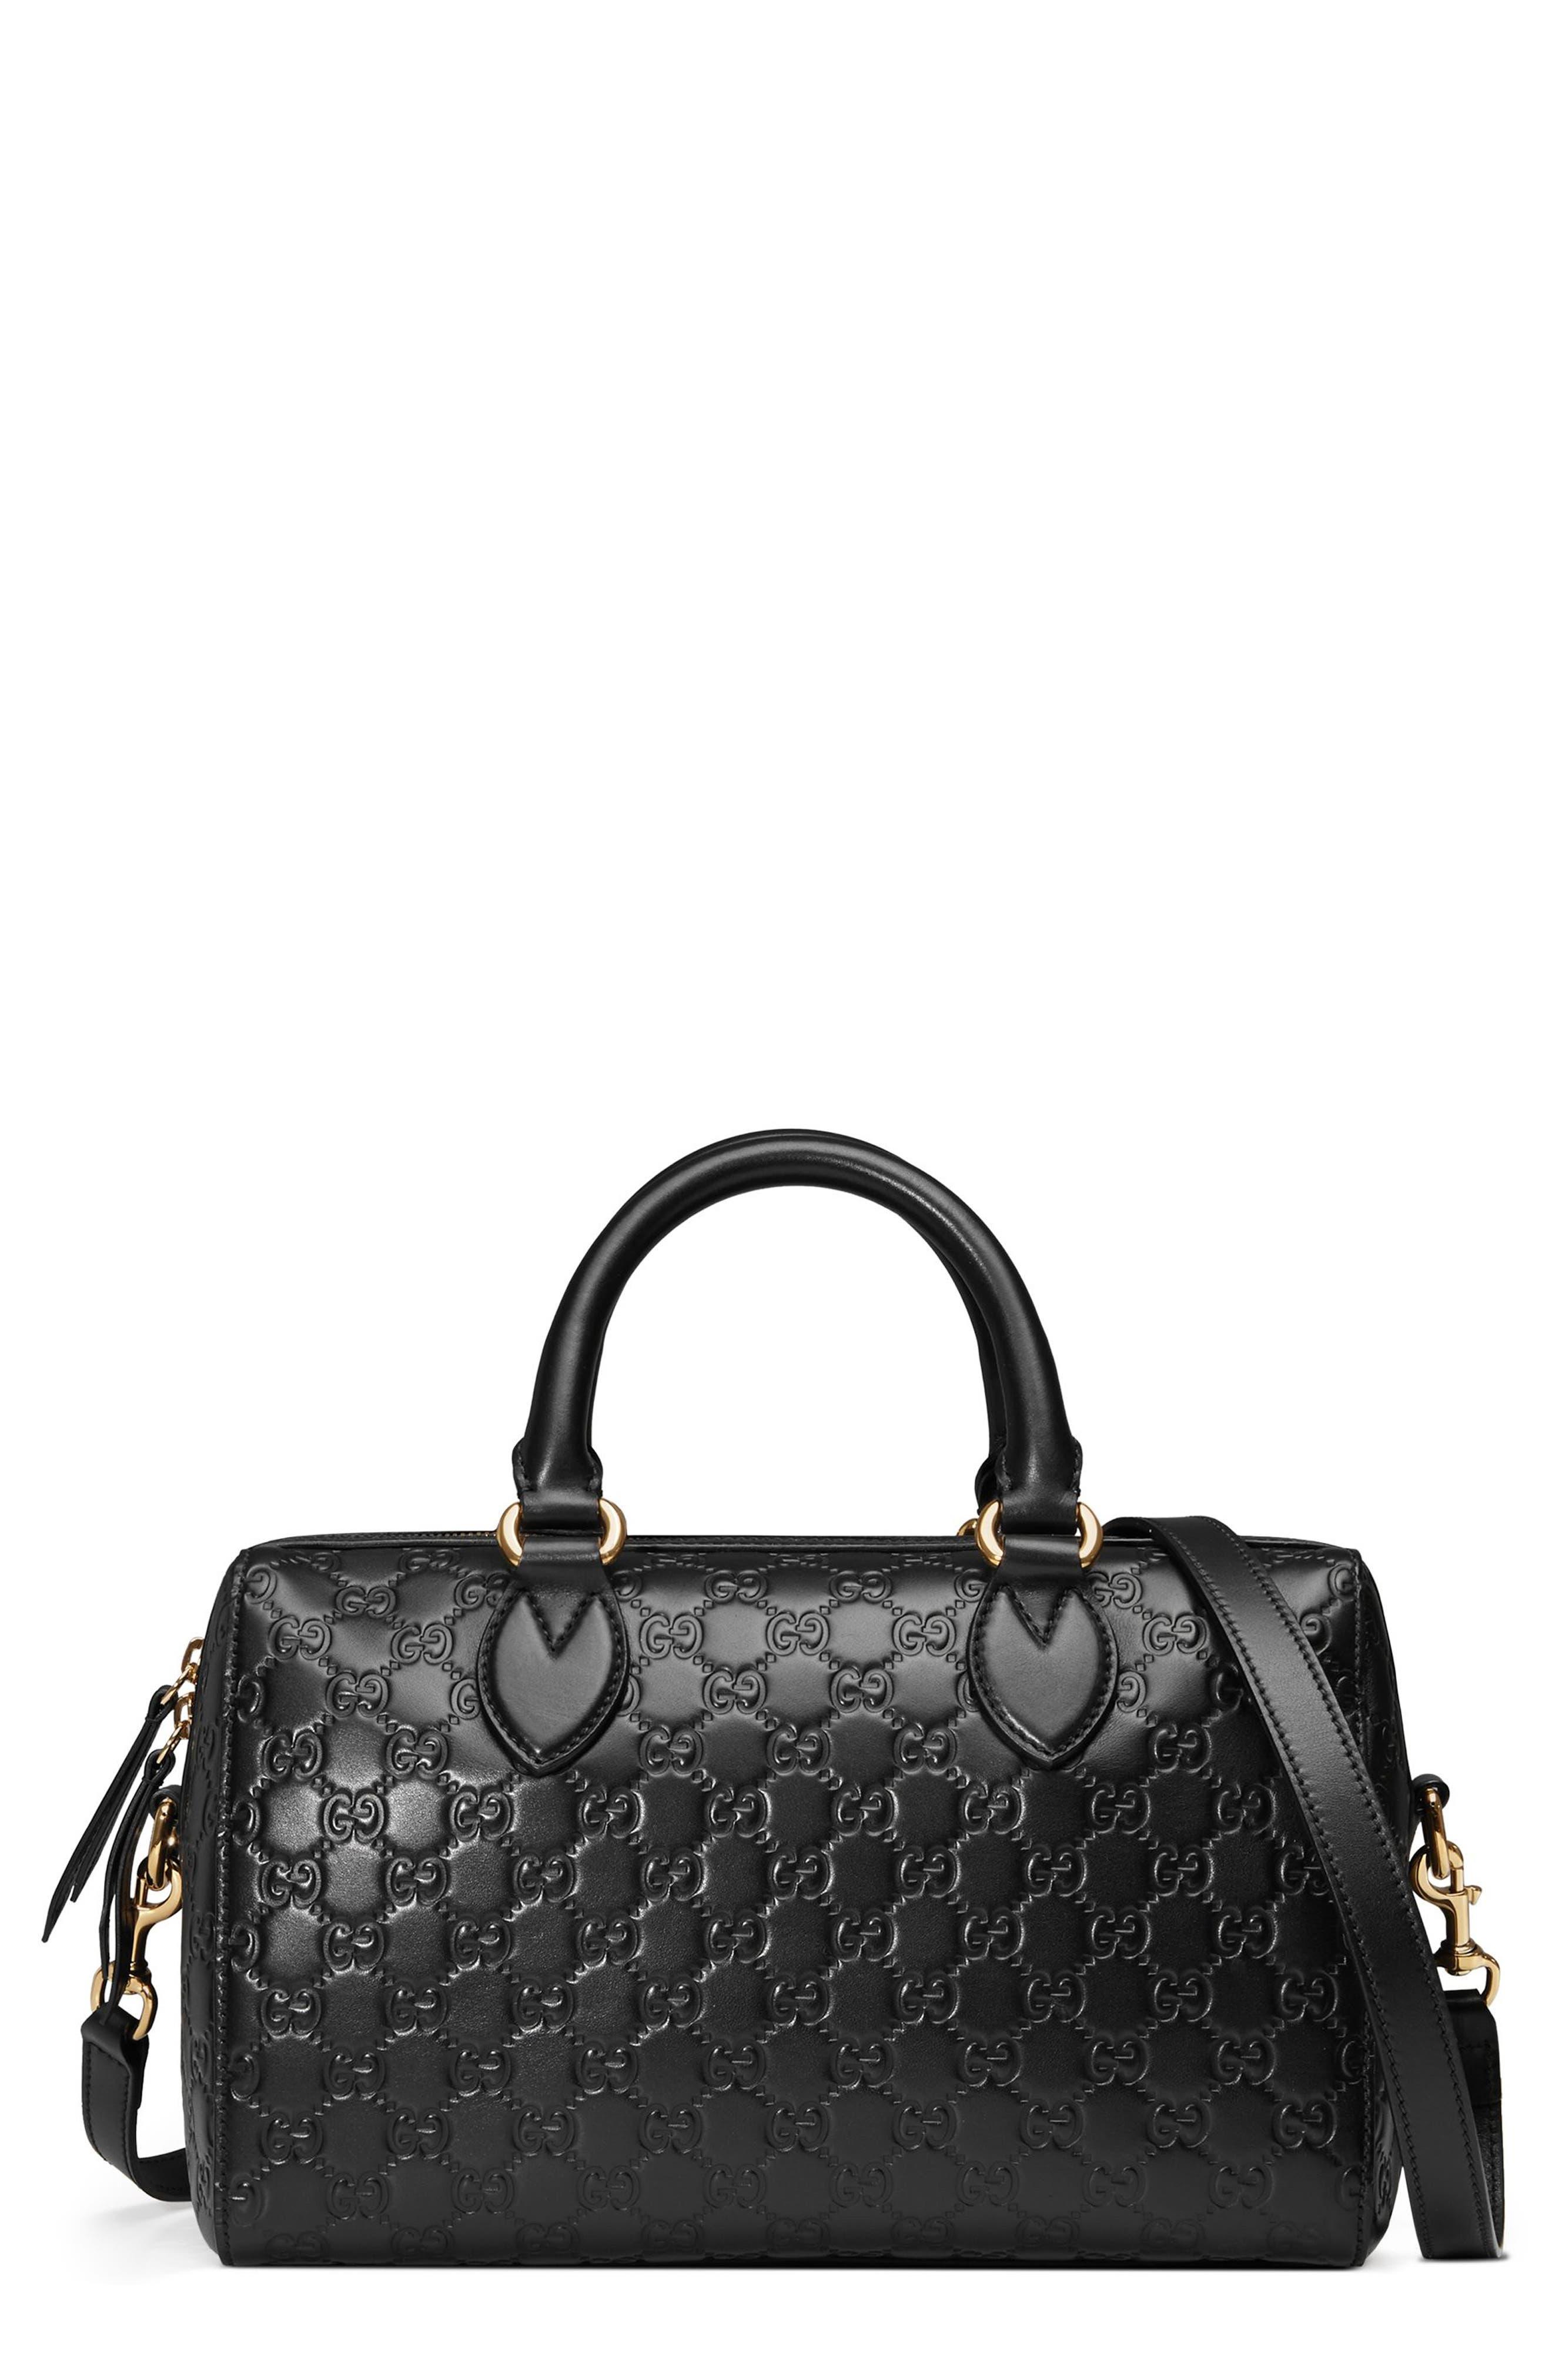 Gucci Medium Signature Top Handle Leather Satchel